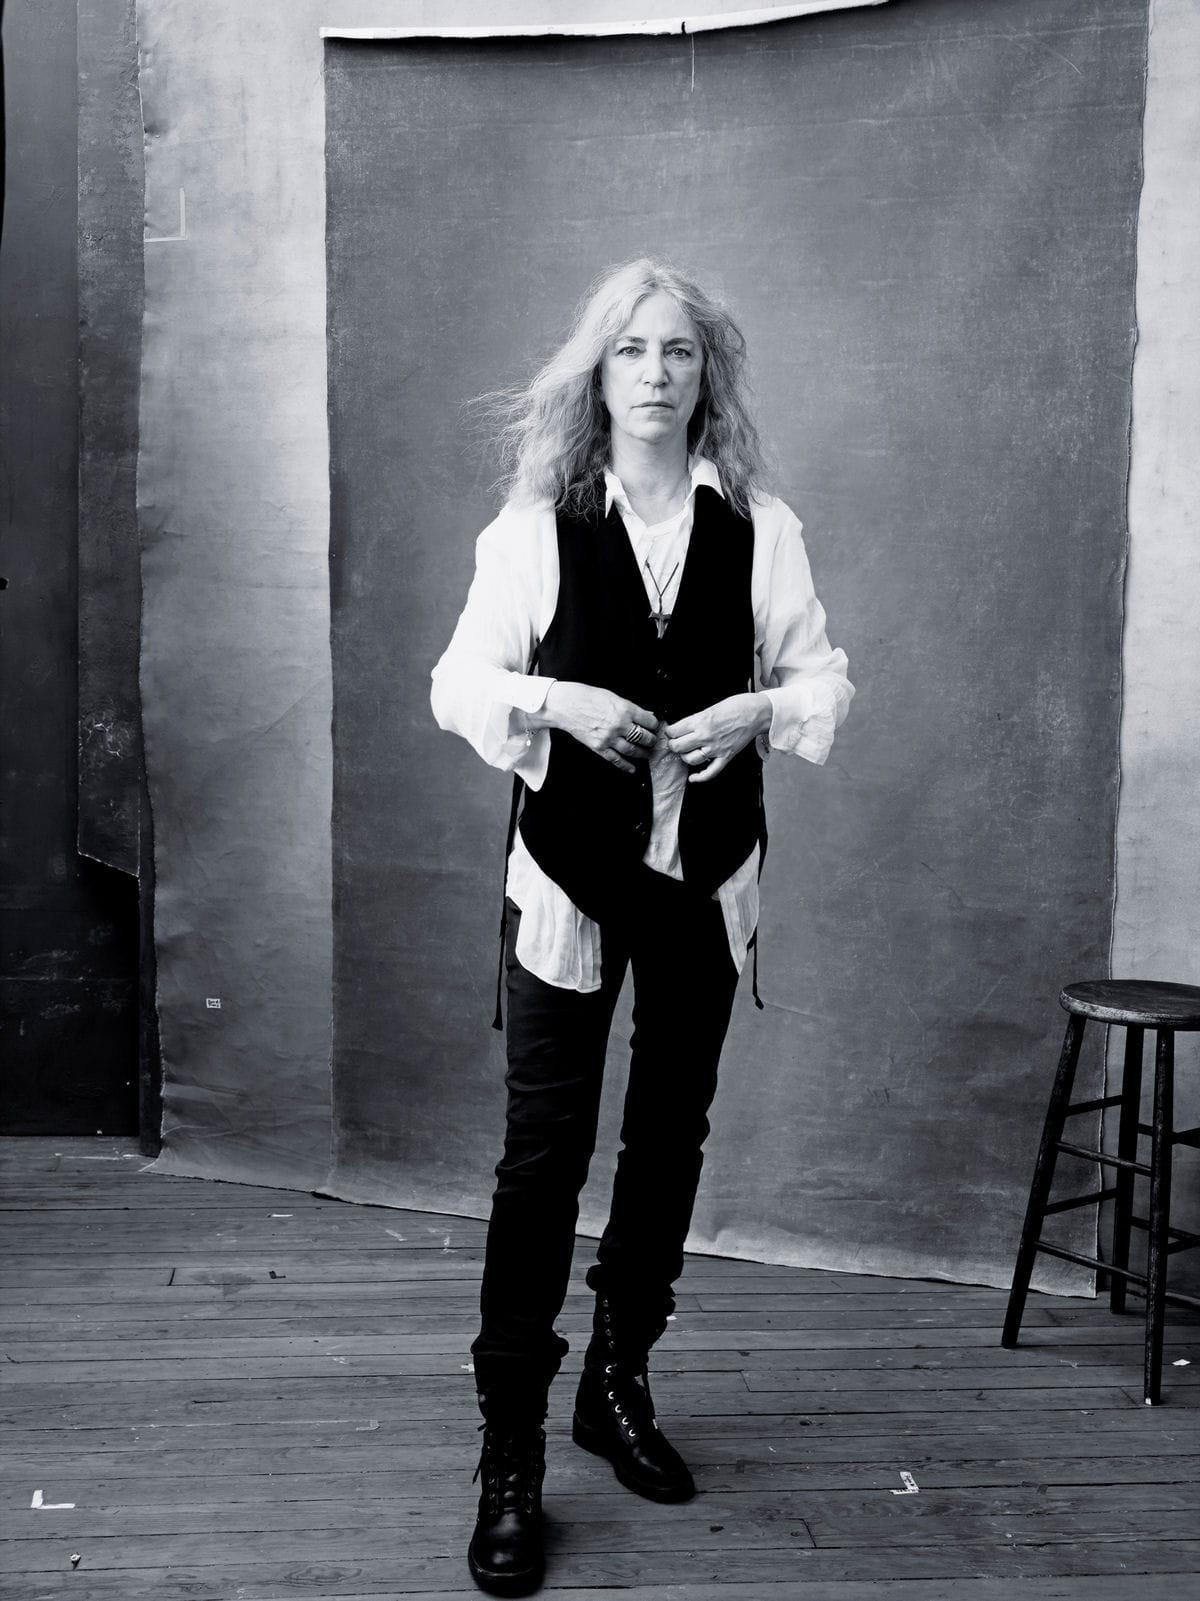 patti smith l gende vivante du rock calendrier pirelli date de sortie les premi res photos. Black Bedroom Furniture Sets. Home Design Ideas